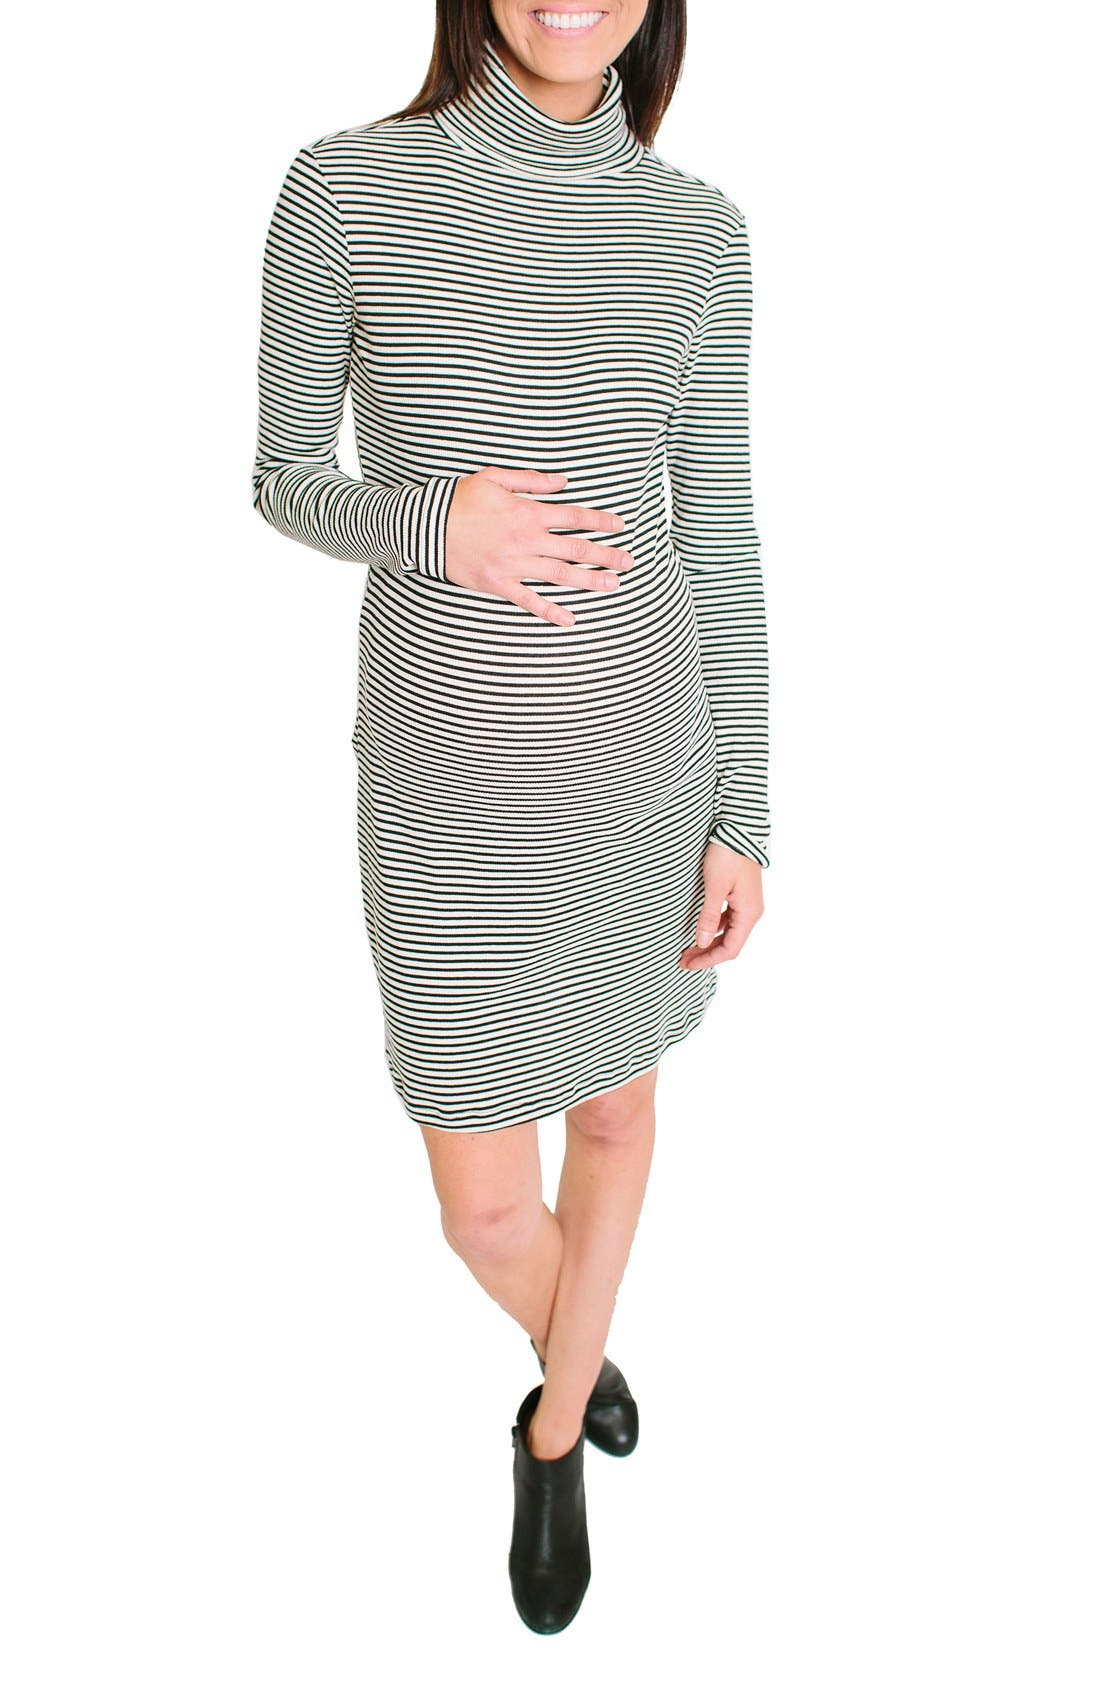 Alternate Image 1 Selected - Nom Maternity Talya Turtleneck Maternity Dress